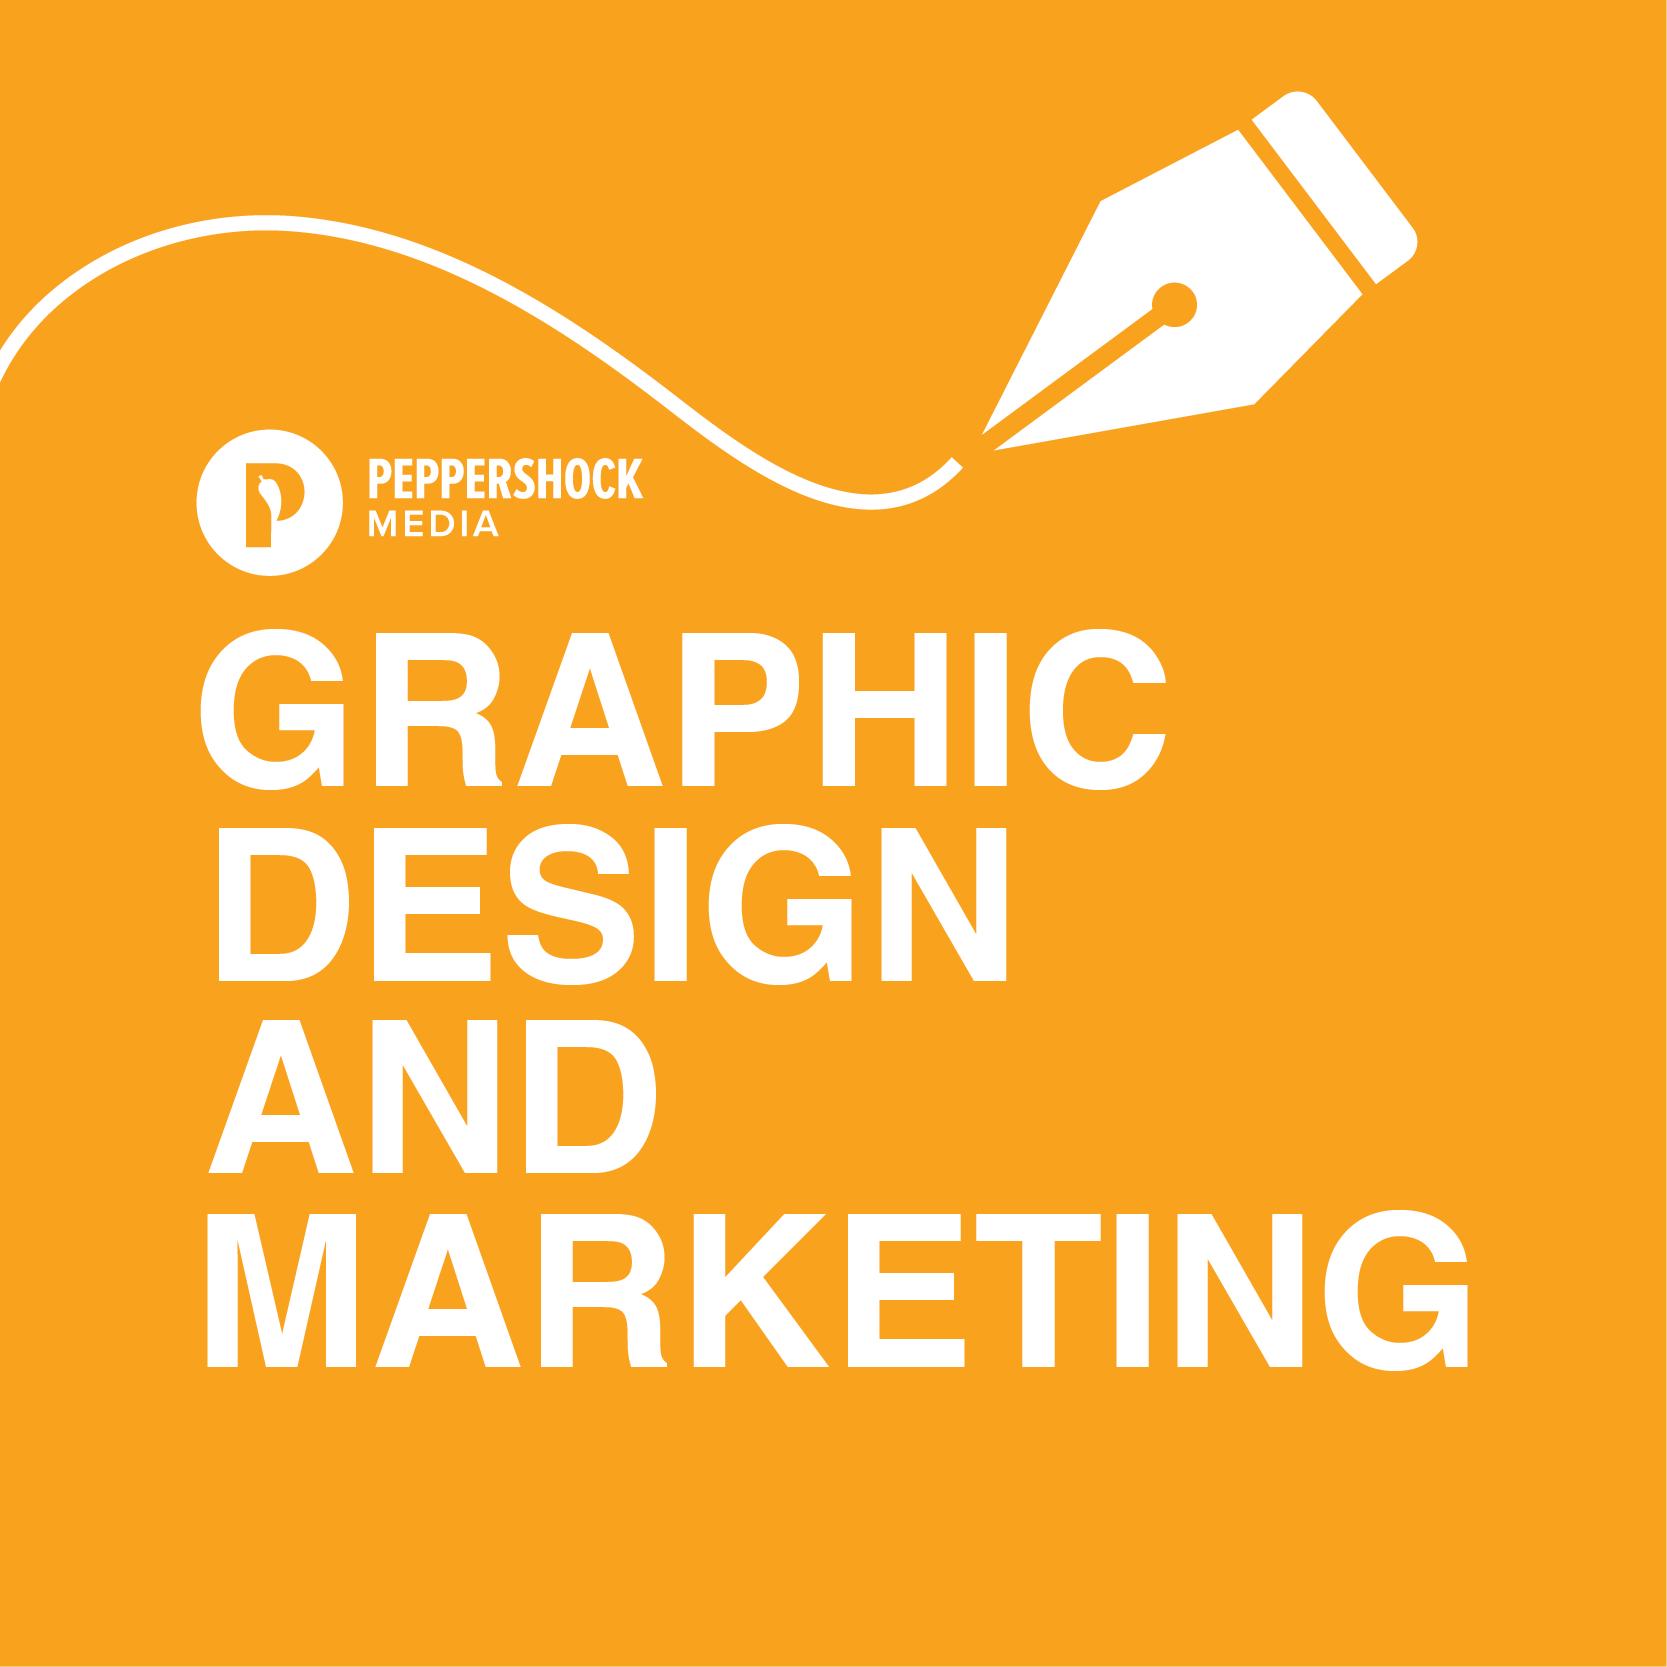 Decorator S Notebook Blog: Graphic-Design-And-Marketing-Blog-01